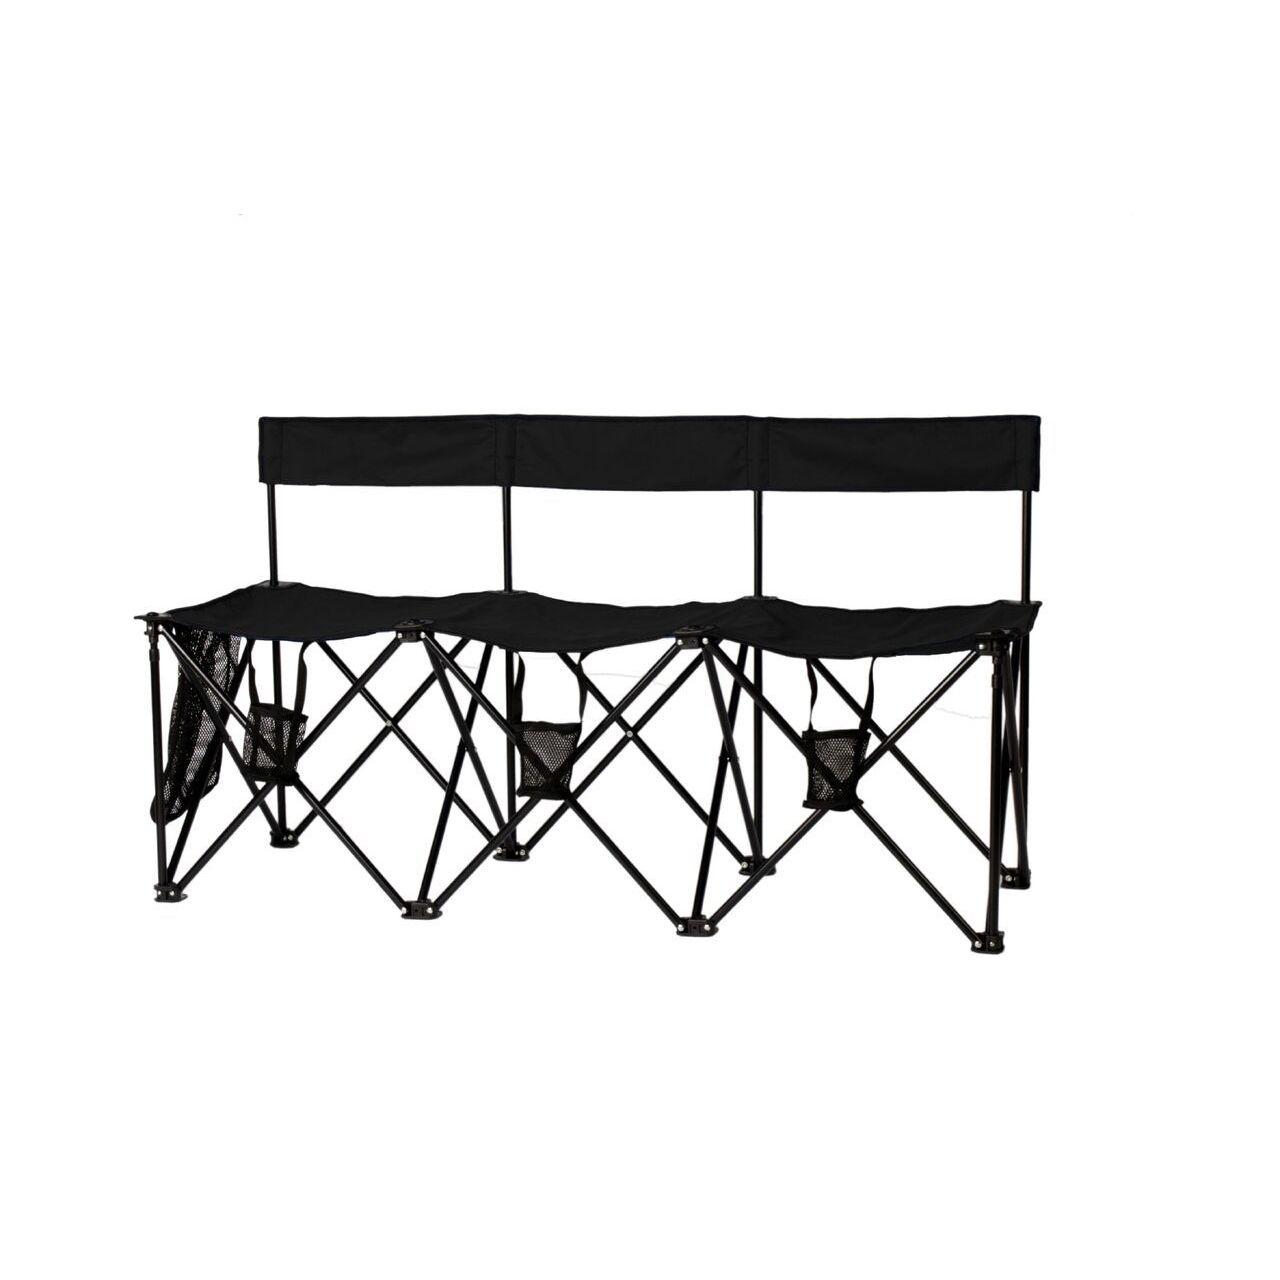 Travelchair TravelChair El Grande 3-seat Bench (Black)